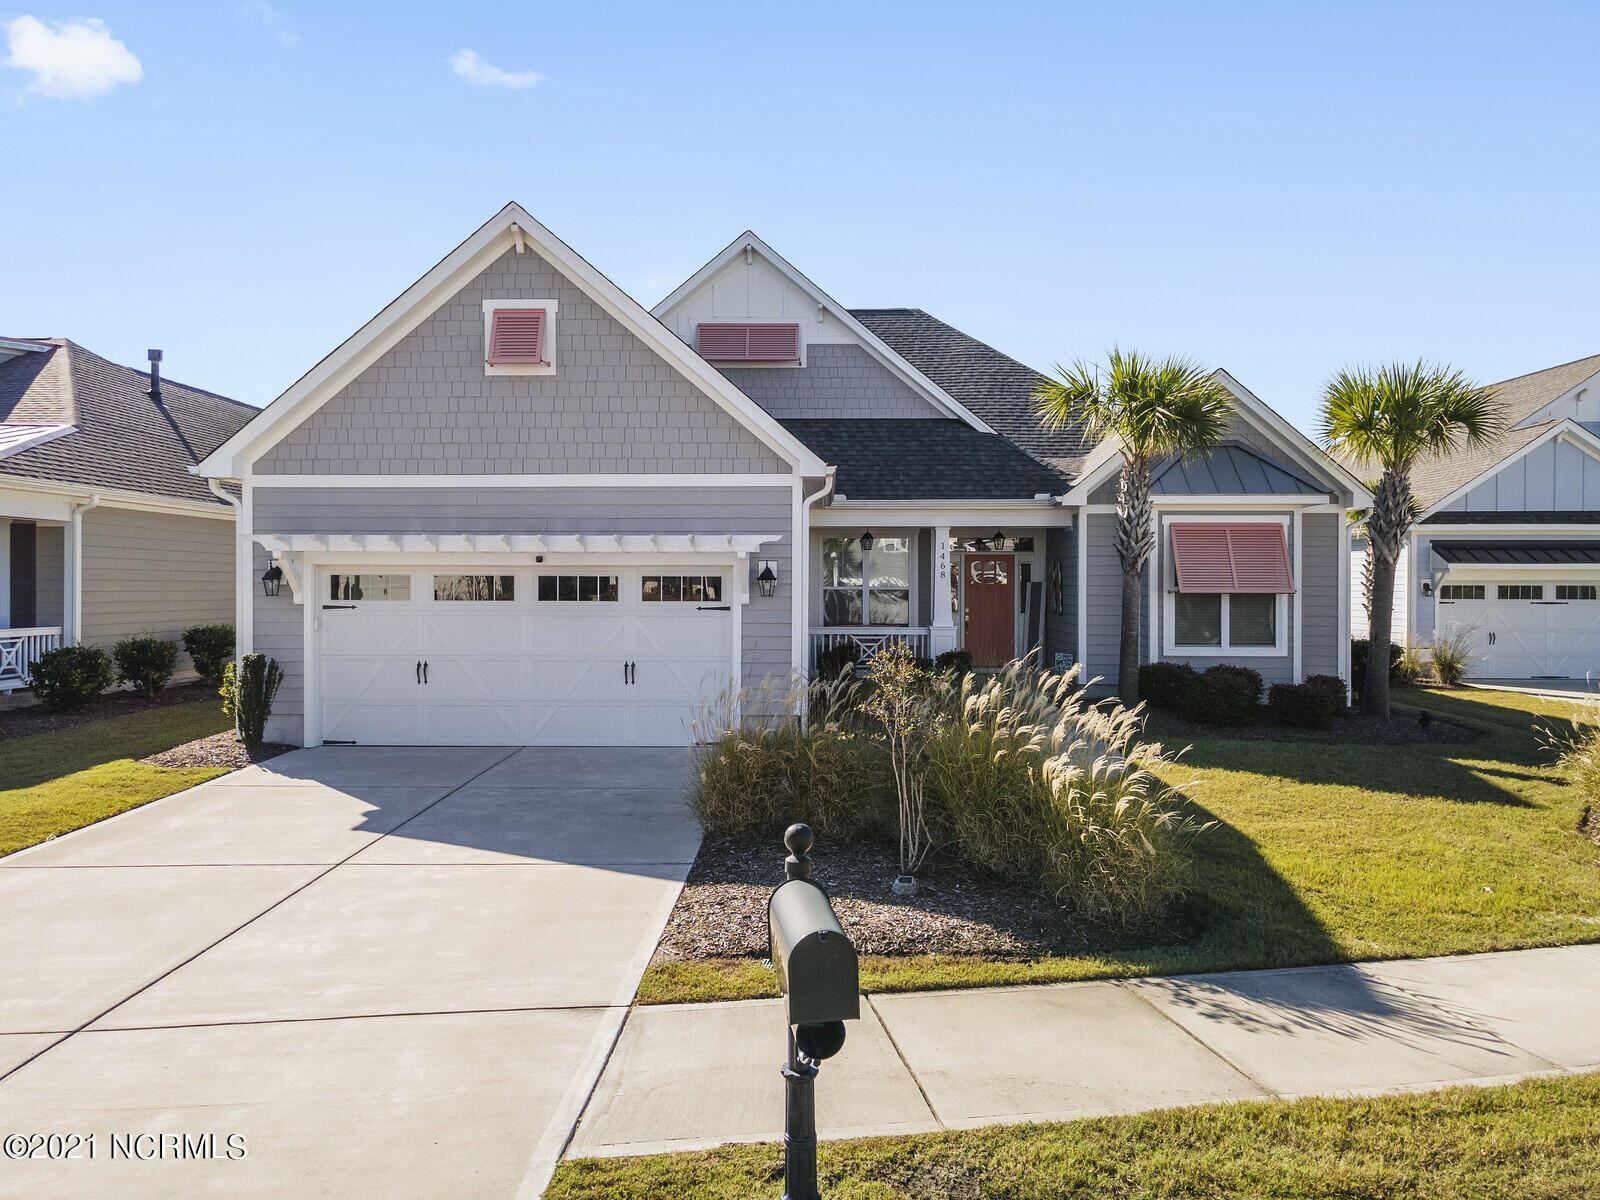 Photo of 1468 Millbrook Drive SW, Ocean Isle Beach, NC 28469 (MLS # 100295976)